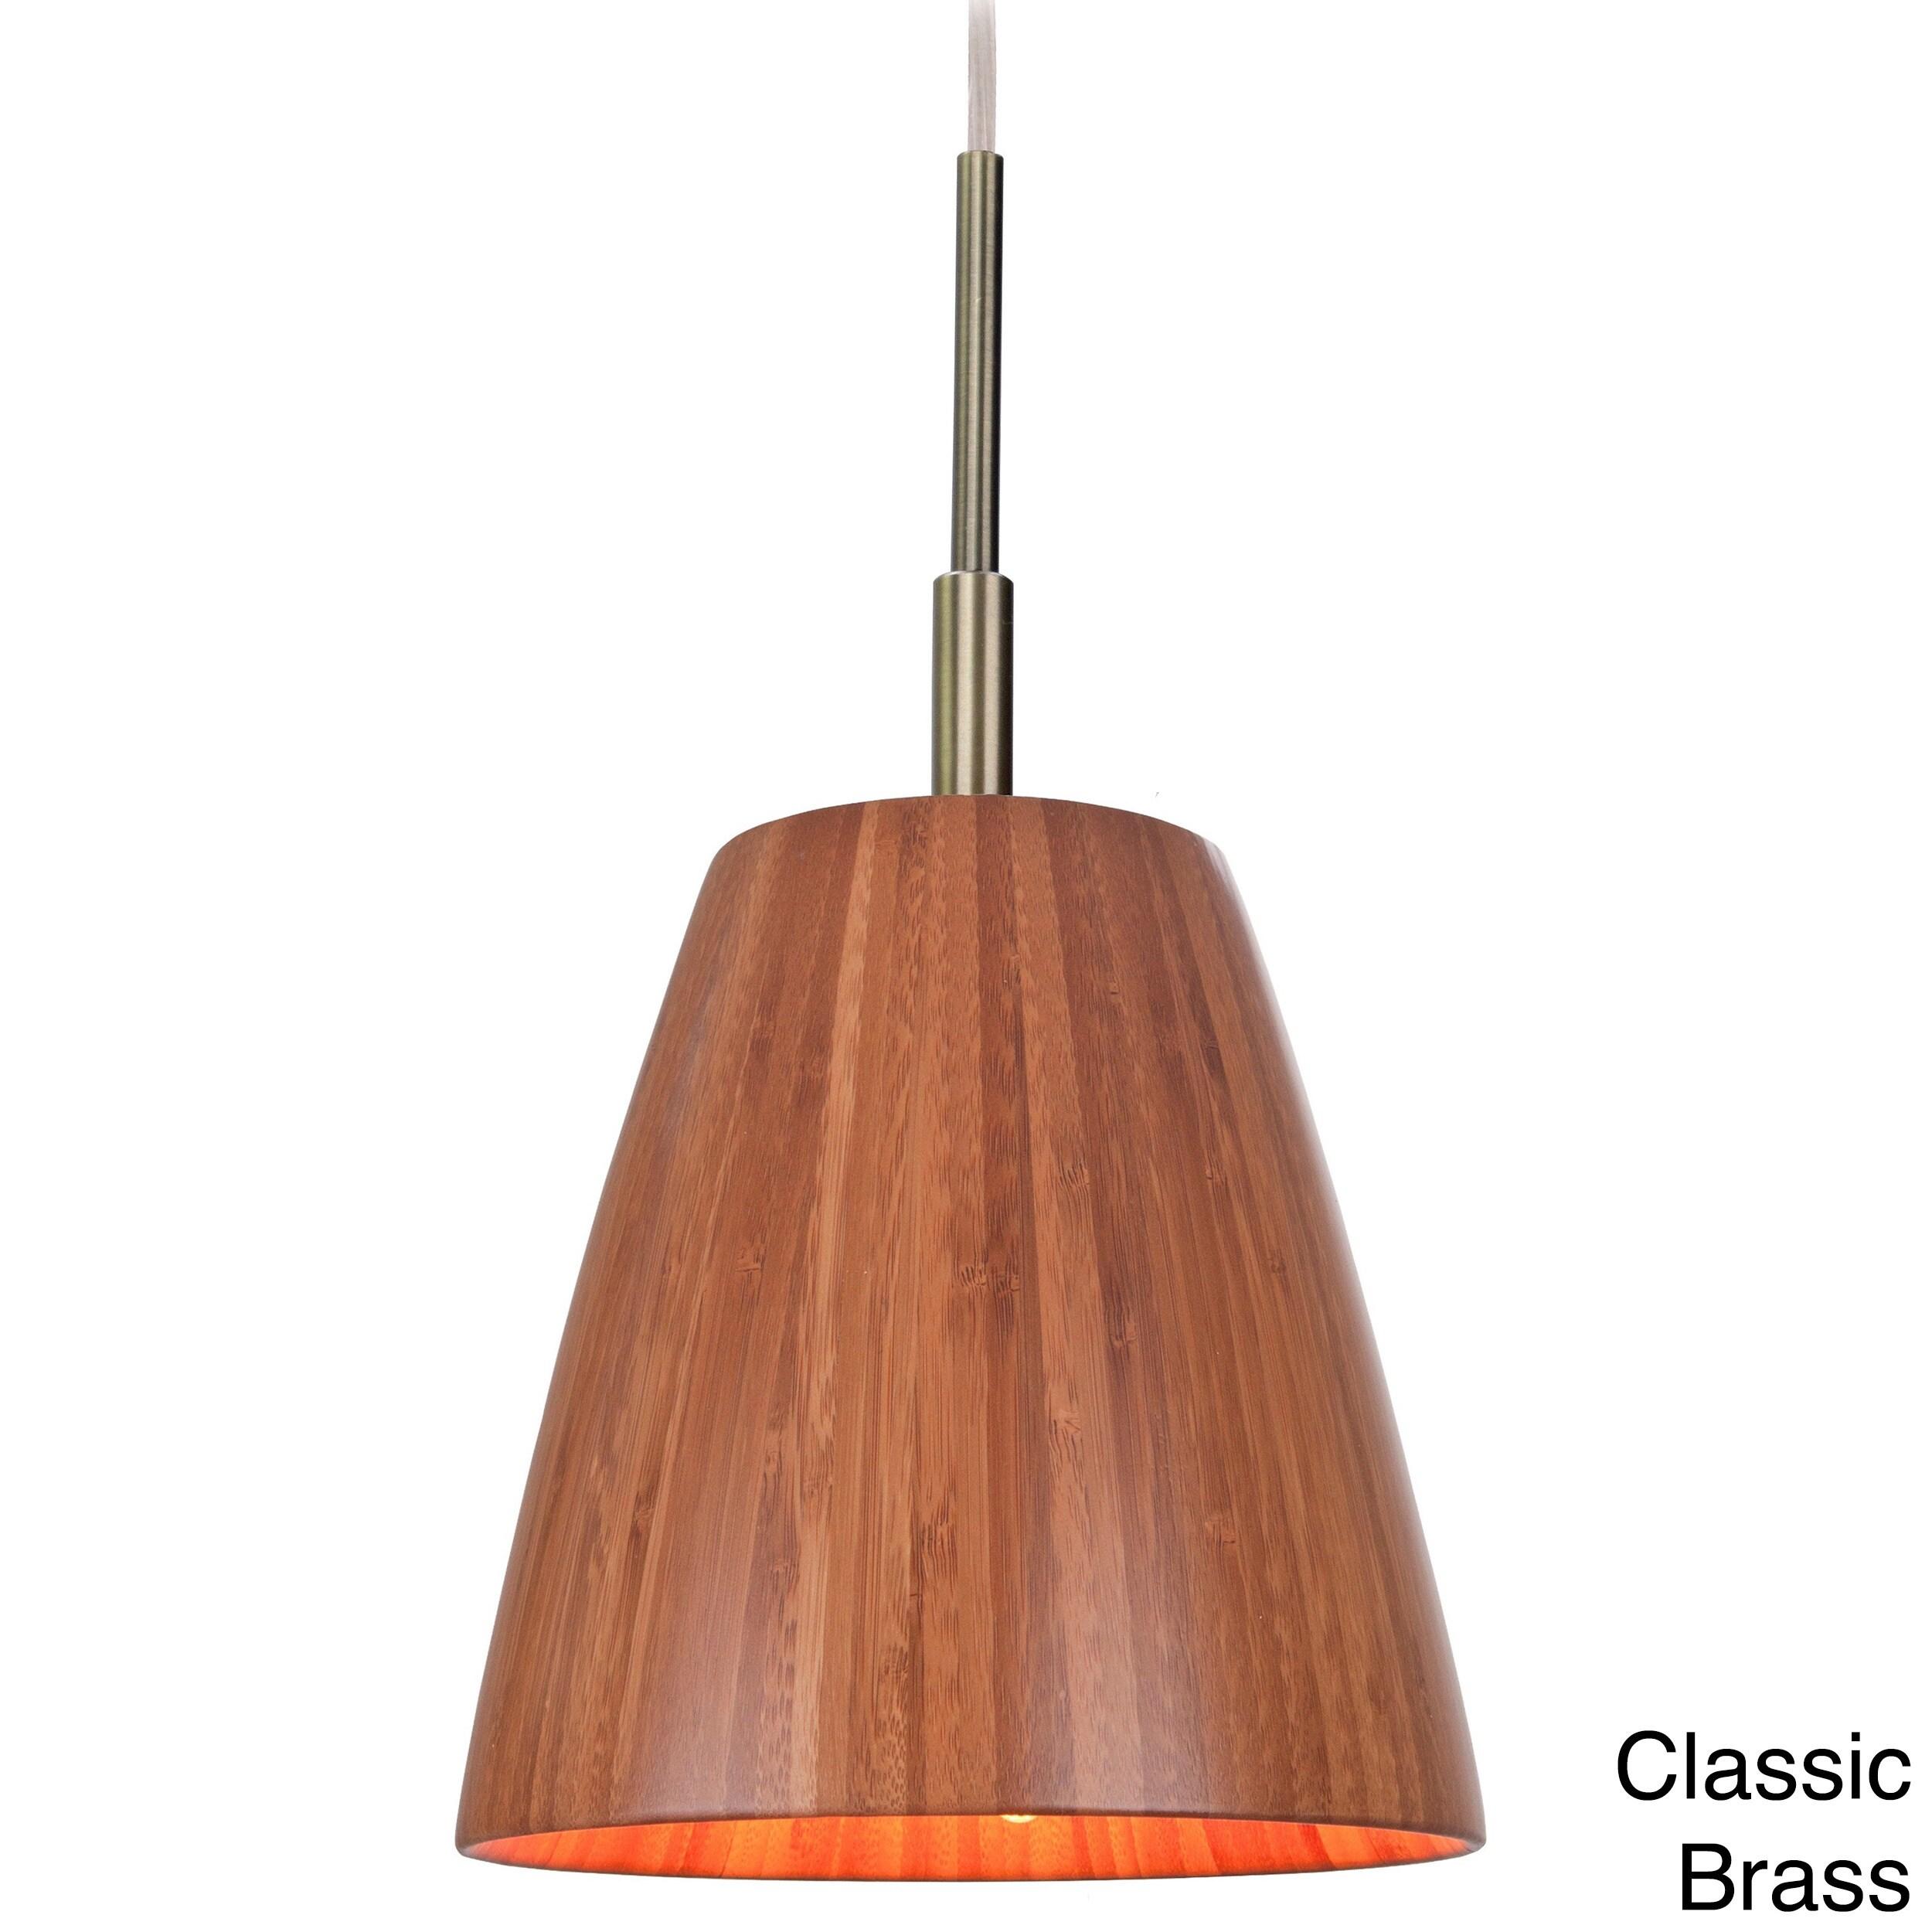 Sorg 1-light Adnap Bamboo Mini Pendant - Free Shipping Today -  Overstock.com - 15682784